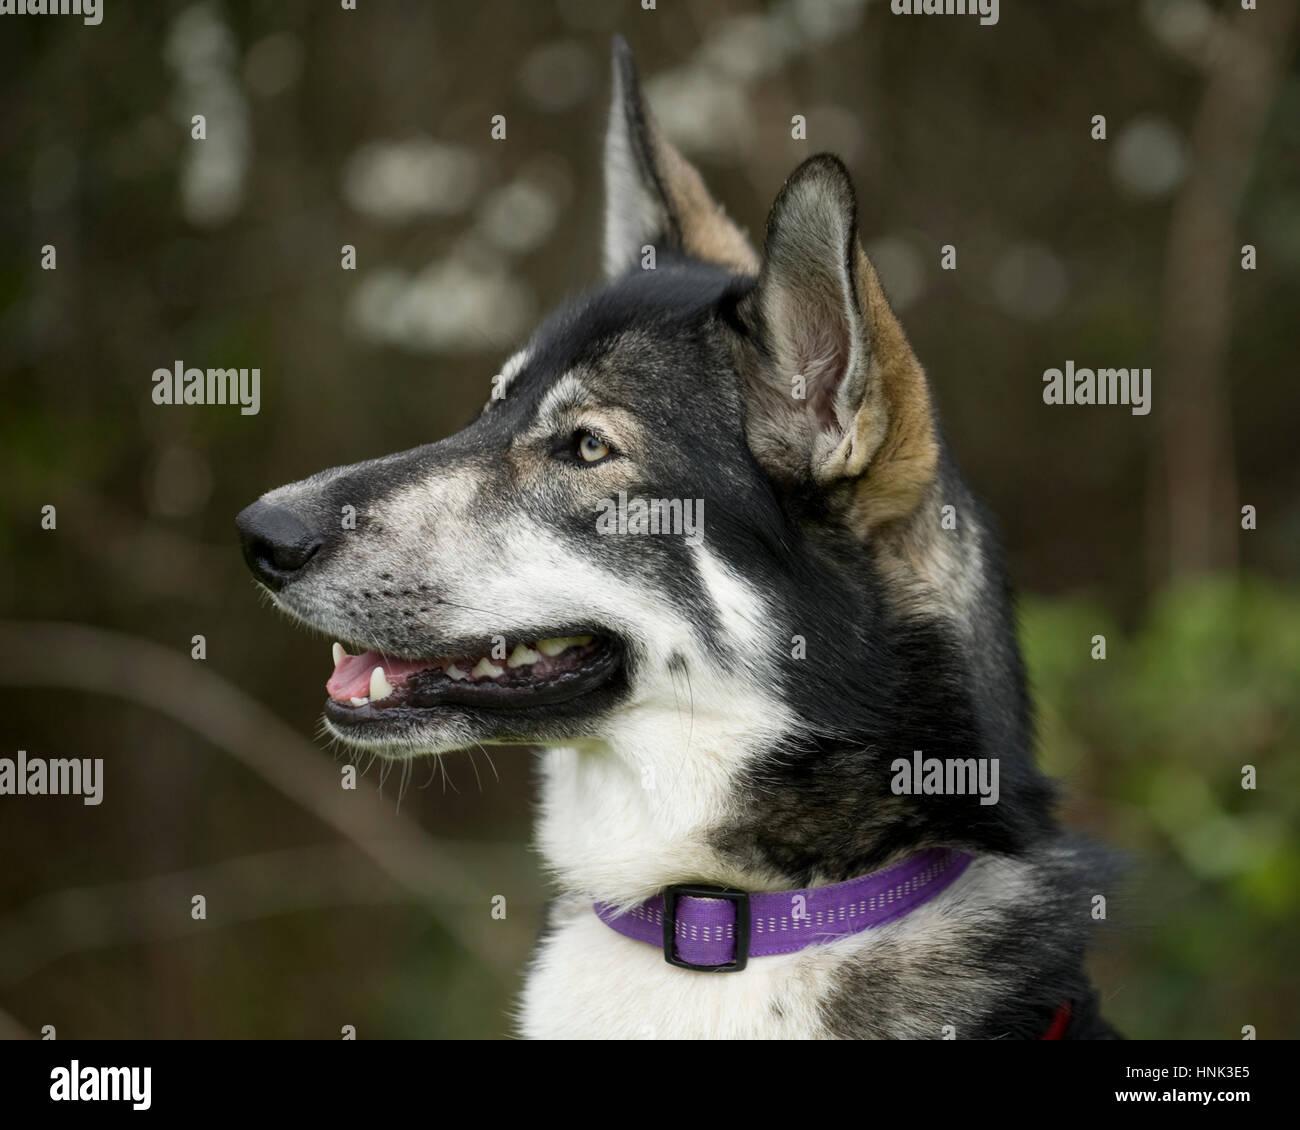 czech wolf dog - Stock Image